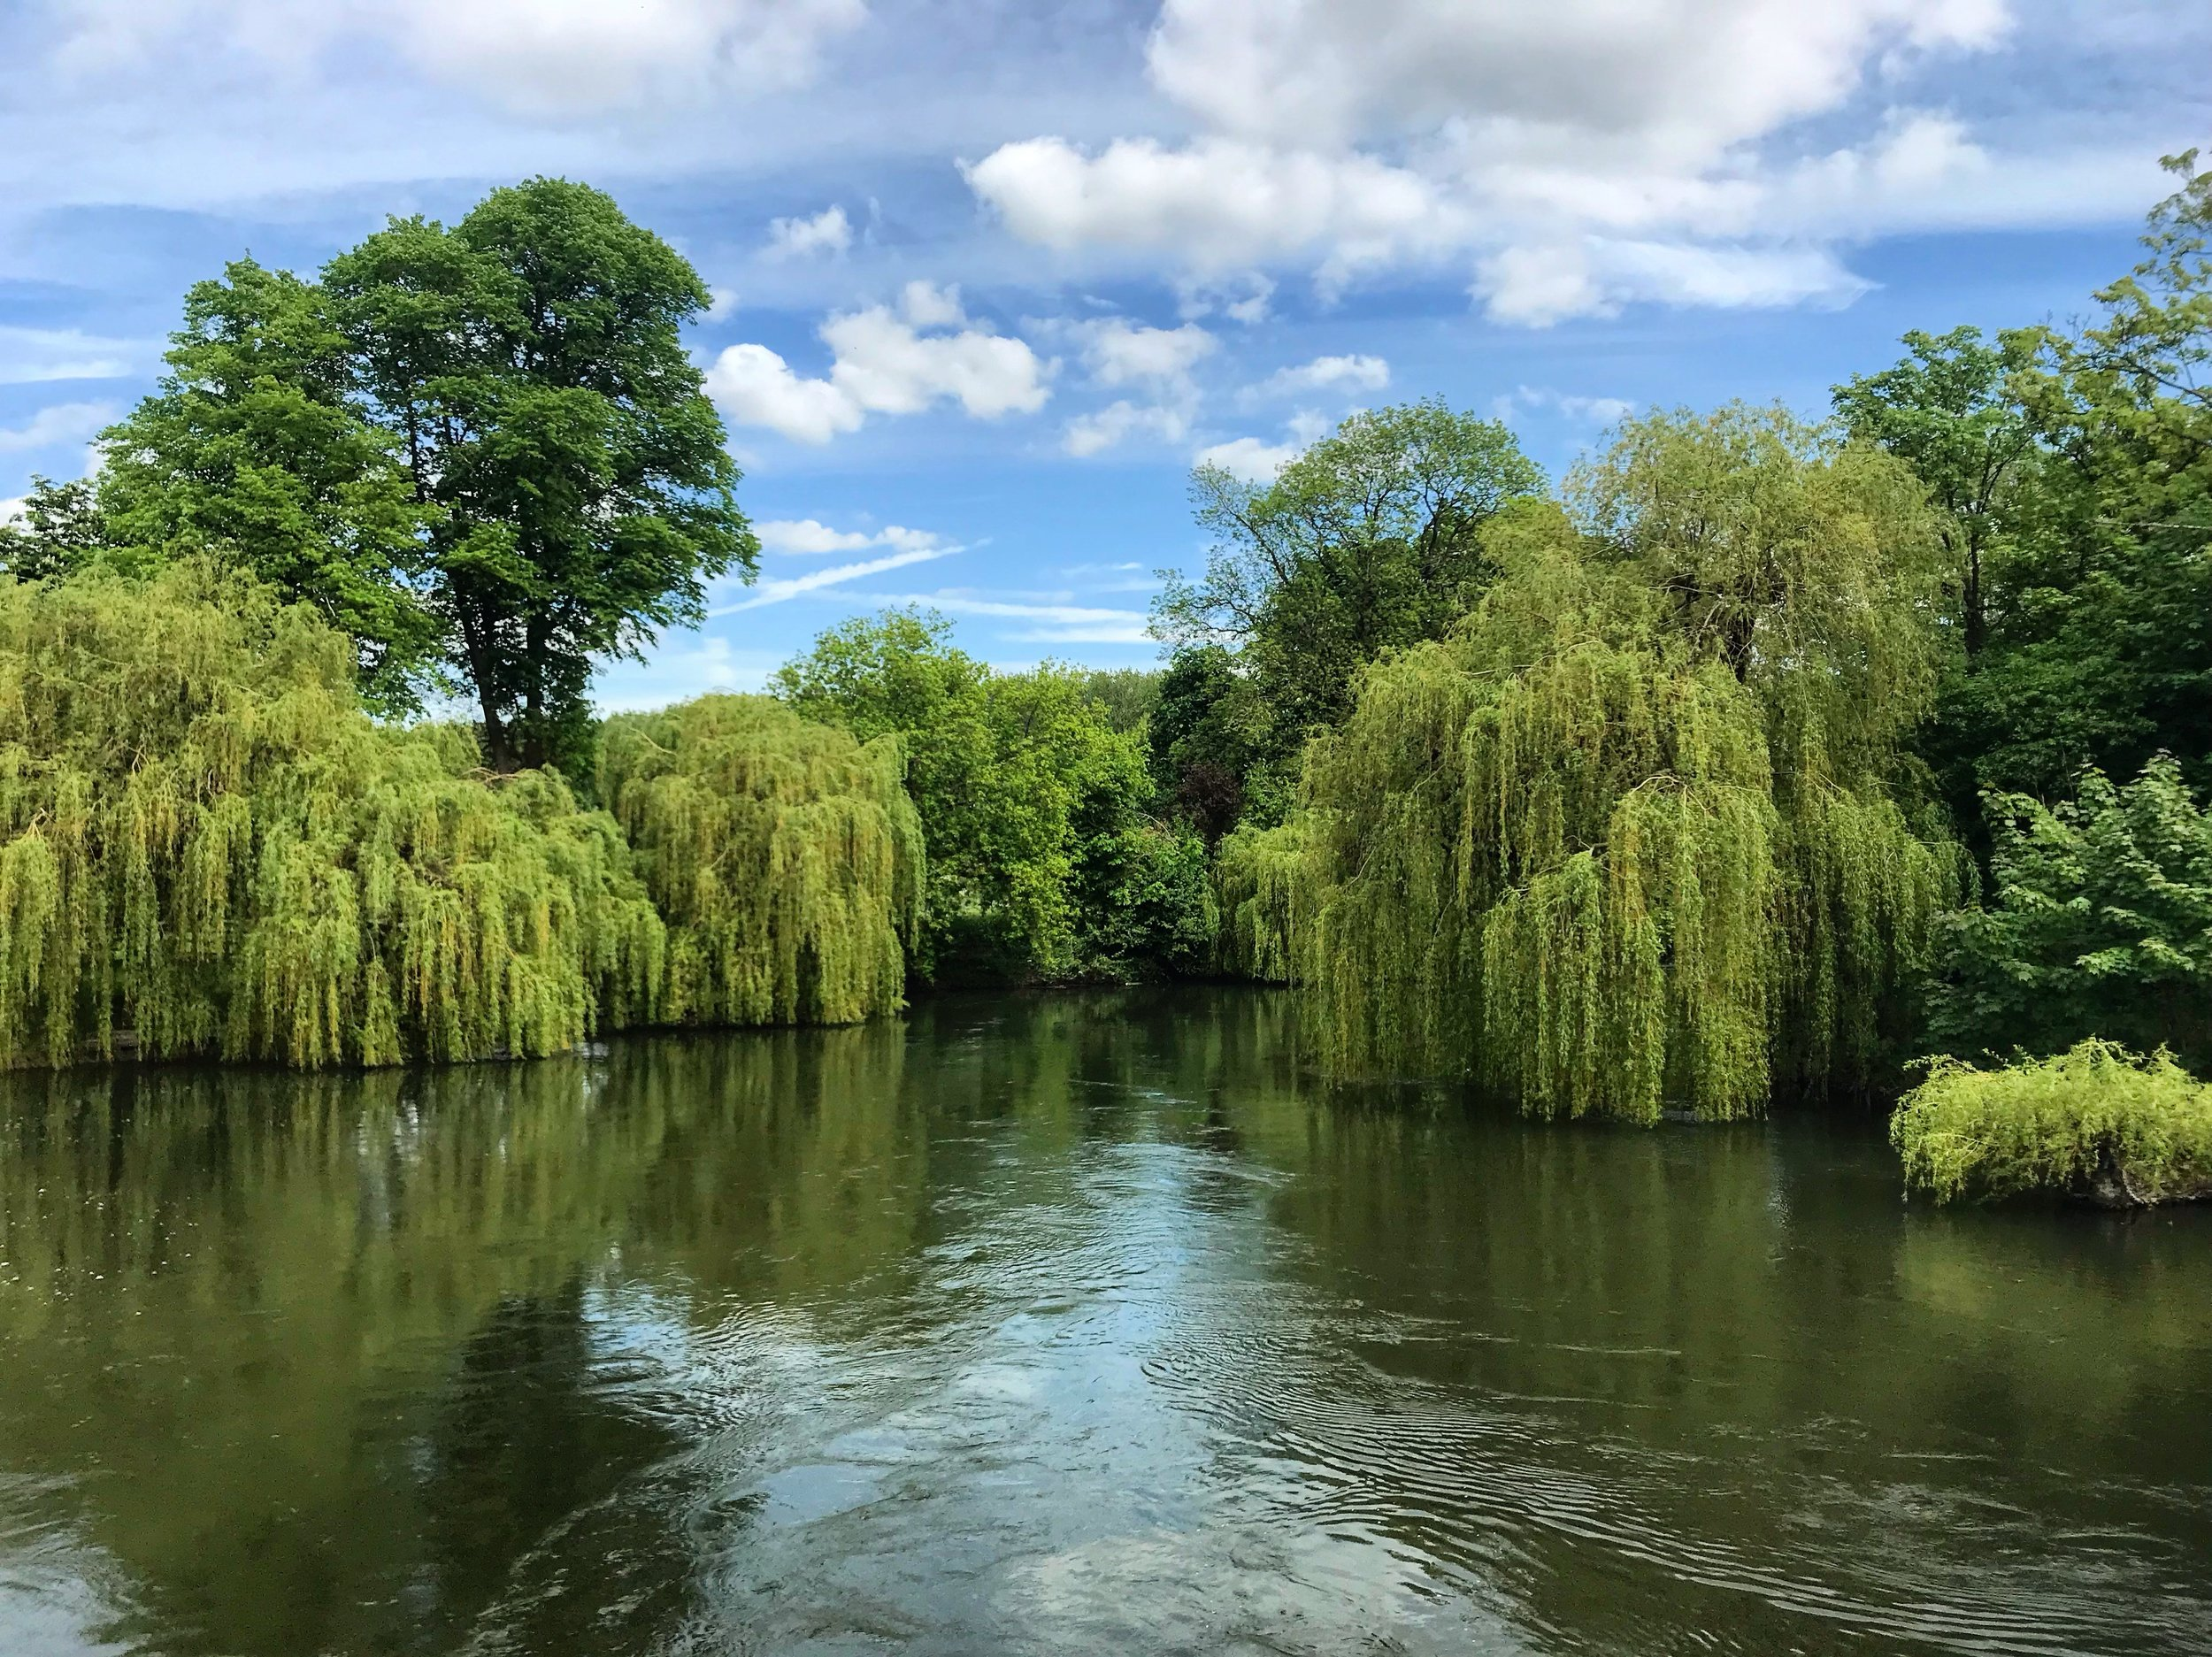 The Thames at Sonning, Berkshire, United Kingdom